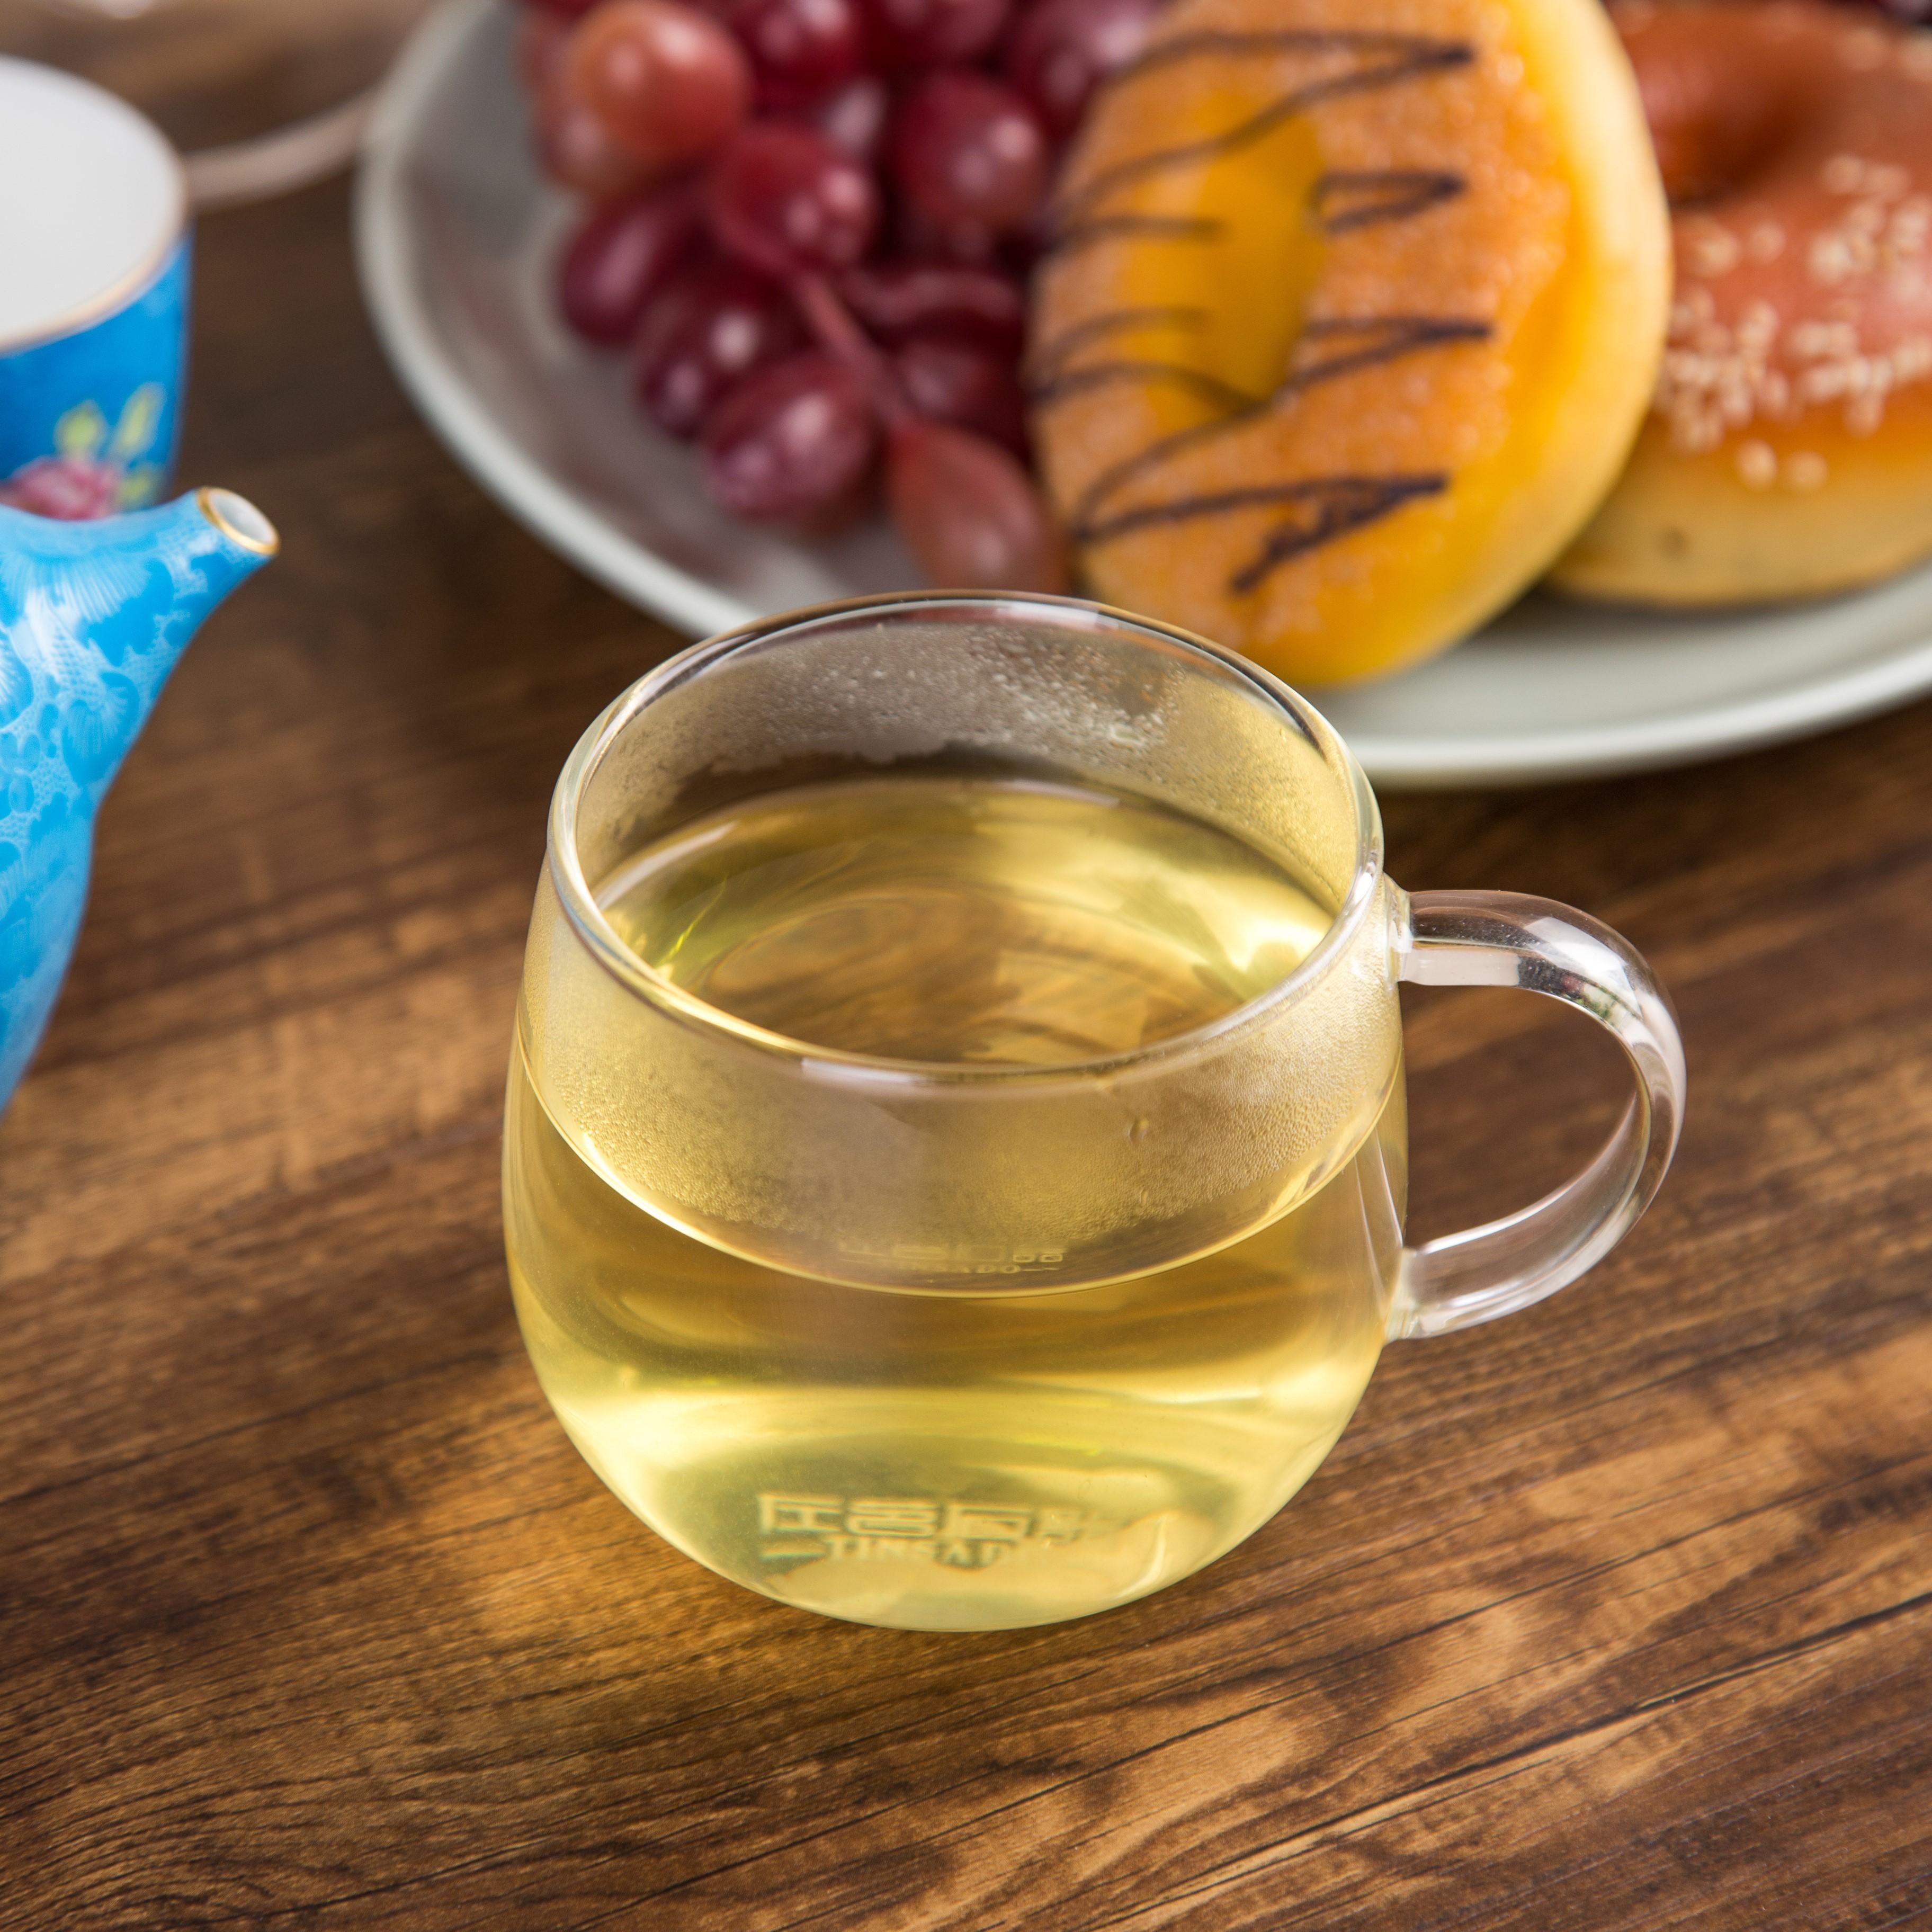 China spring leaf slimming tea of health benefits earl grey green organic tea shop L - 4uTea | 4uTea.com